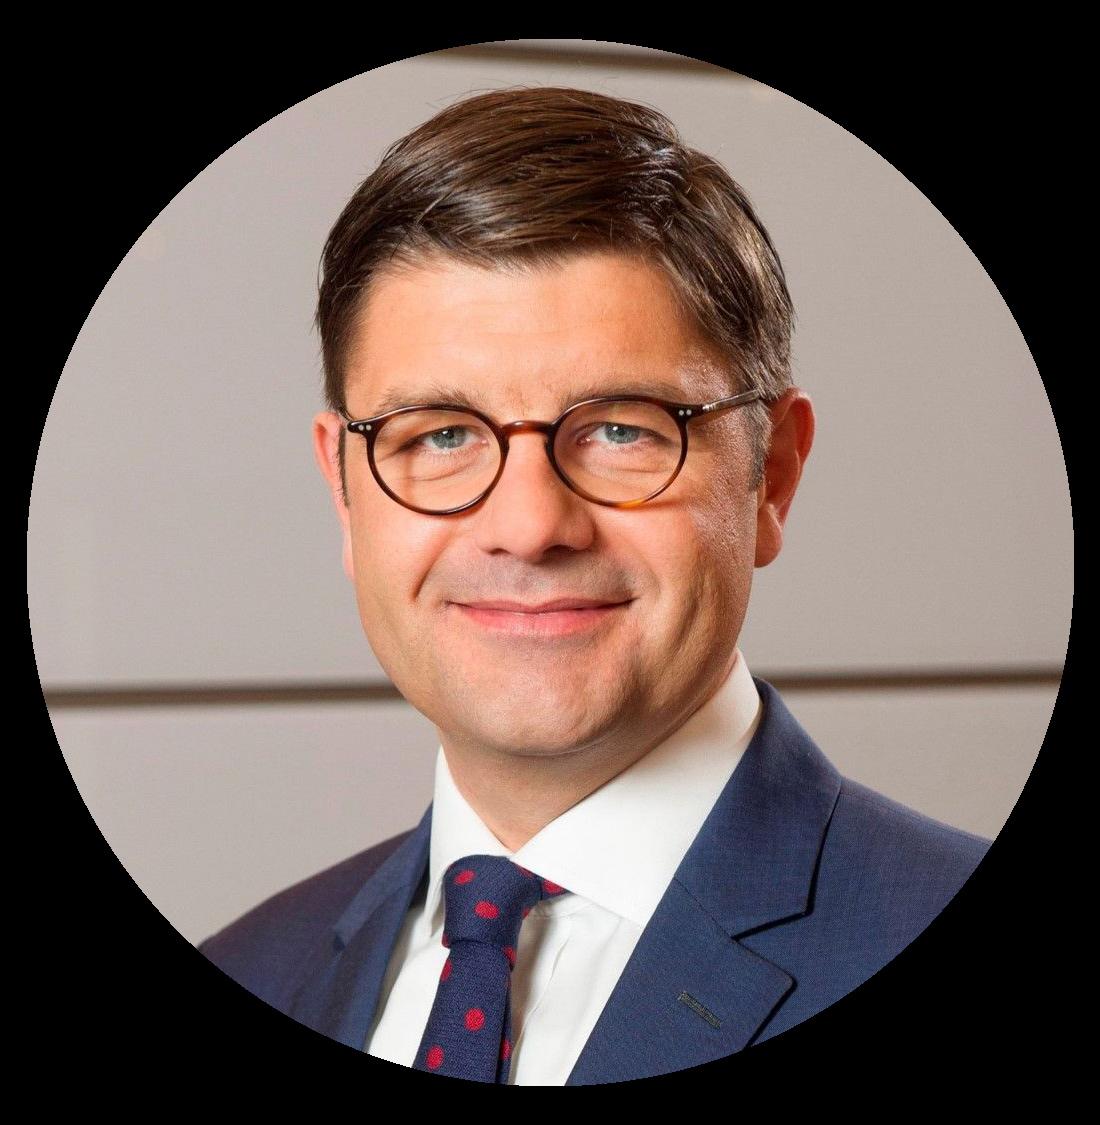 Portraitfoto von Dr. Christian Janze